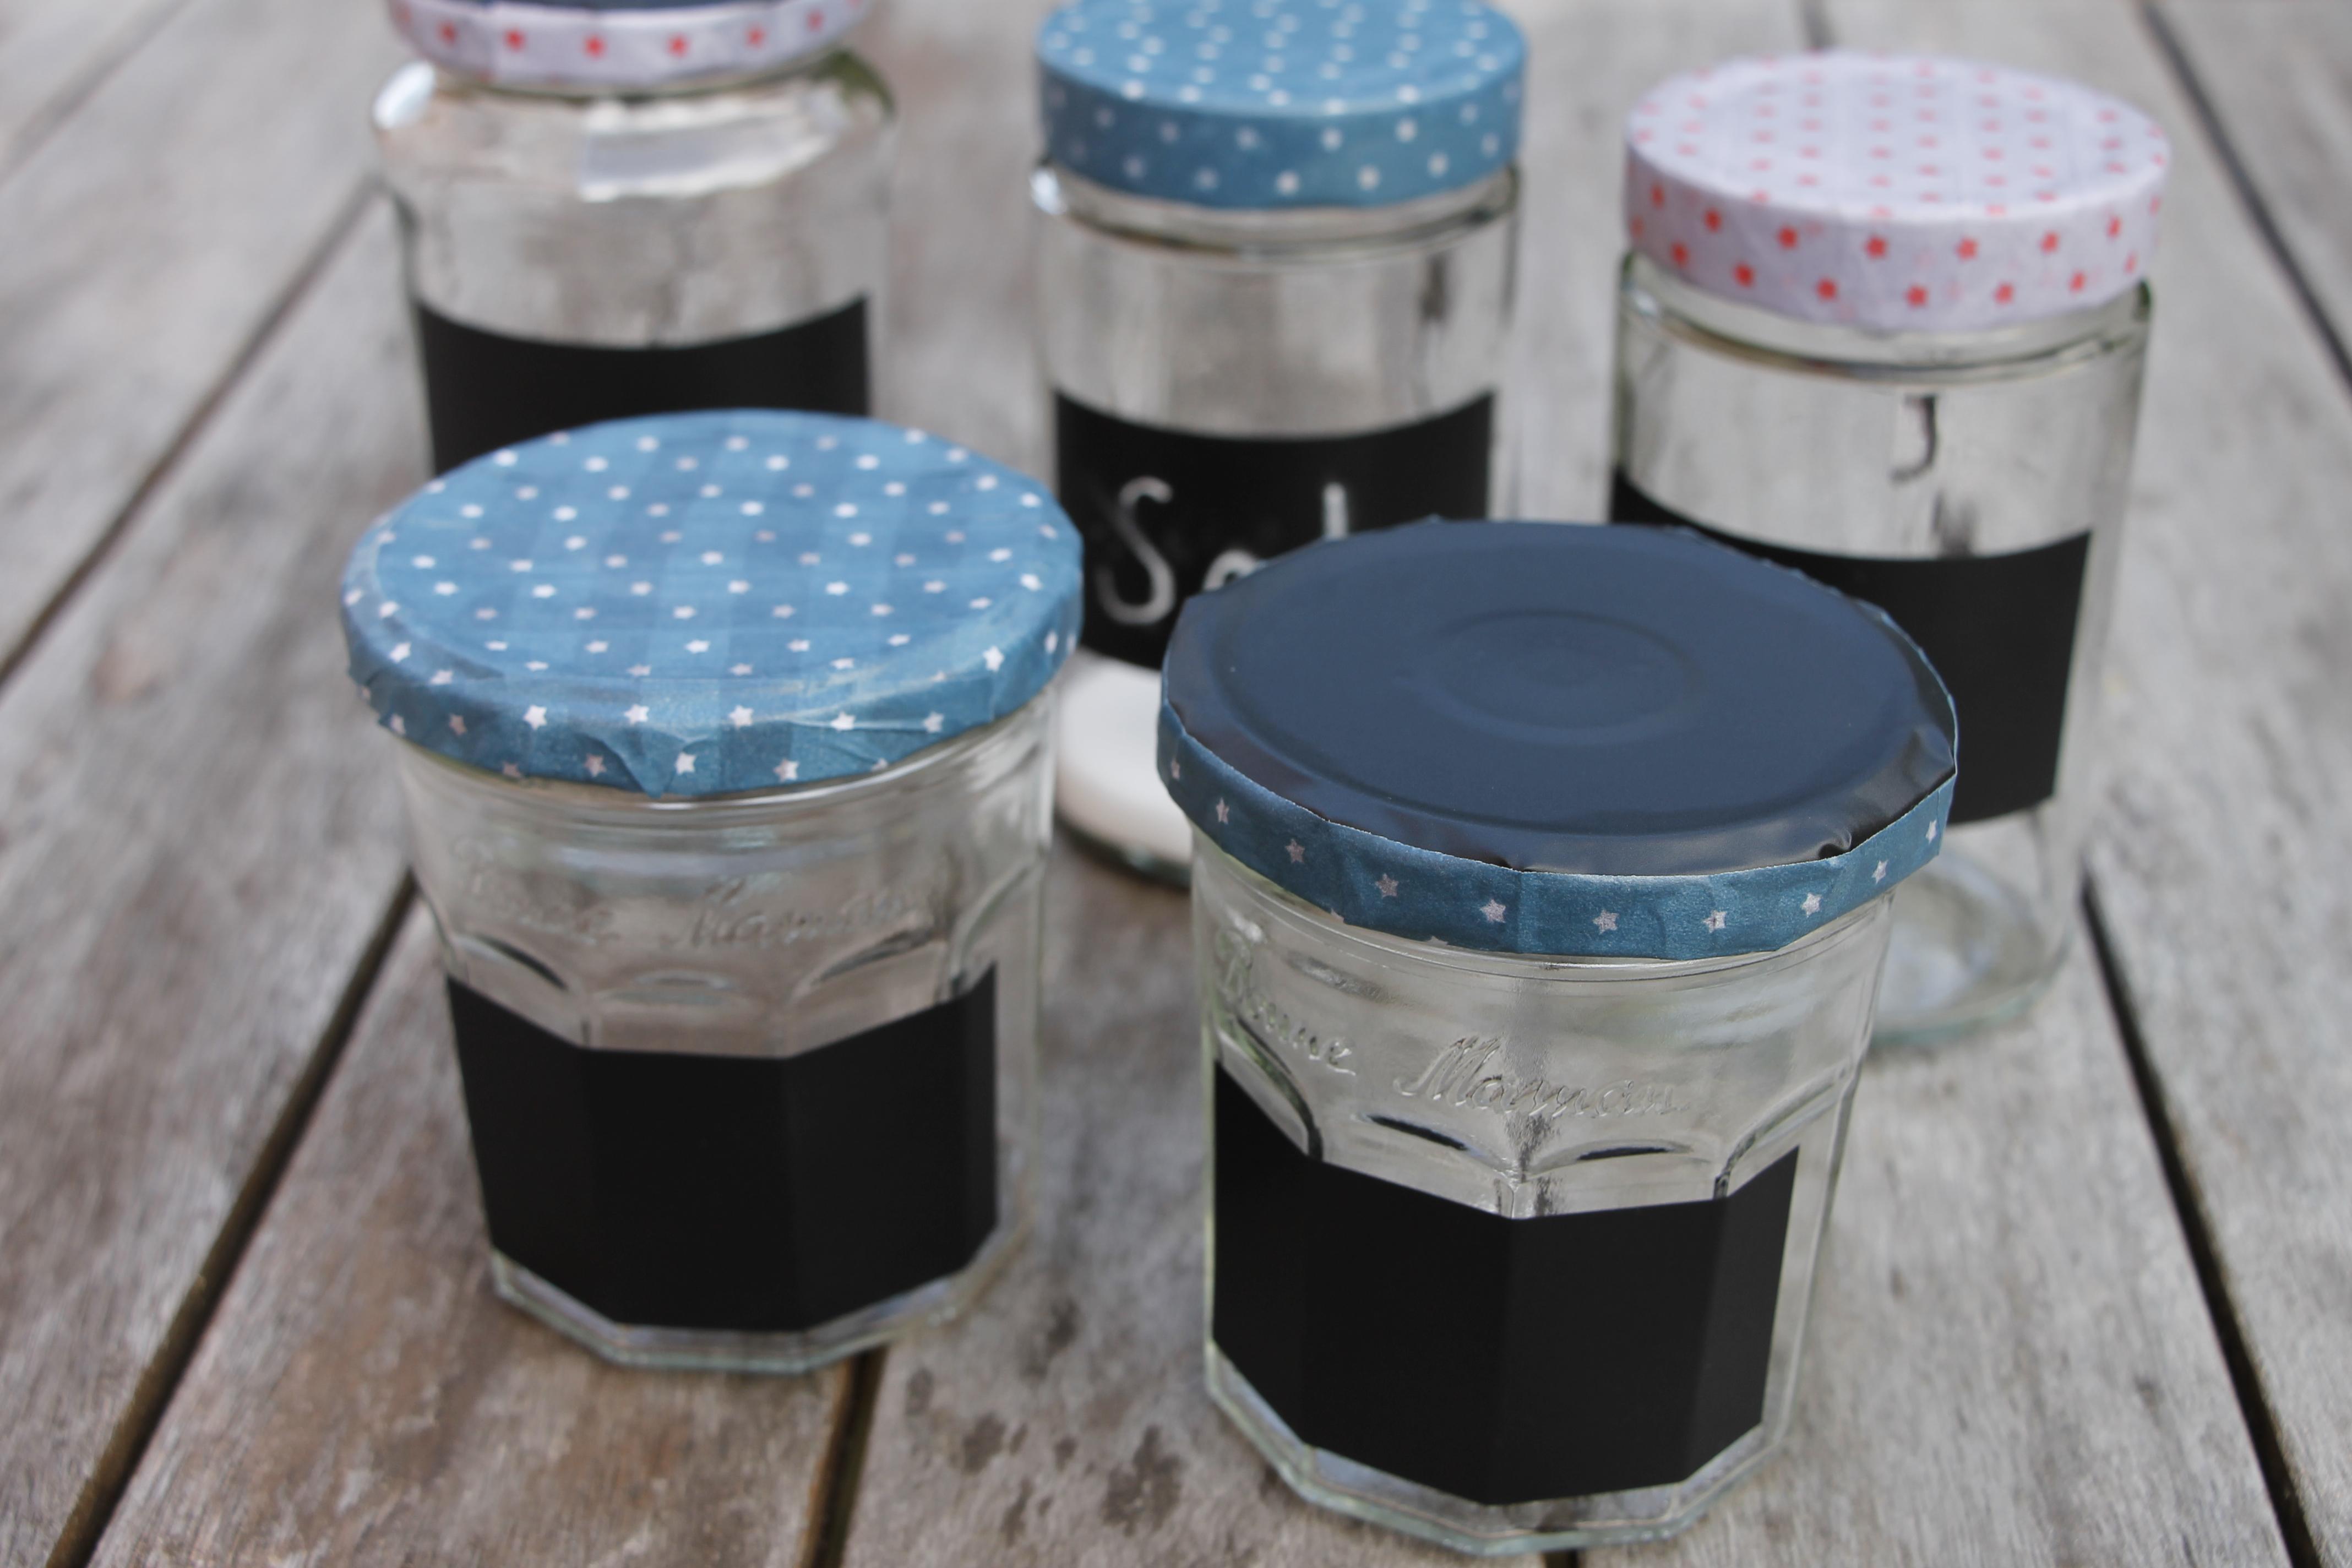 diy ideen mit tafelfolie und washi tape lavendelblog. Black Bedroom Furniture Sets. Home Design Ideas